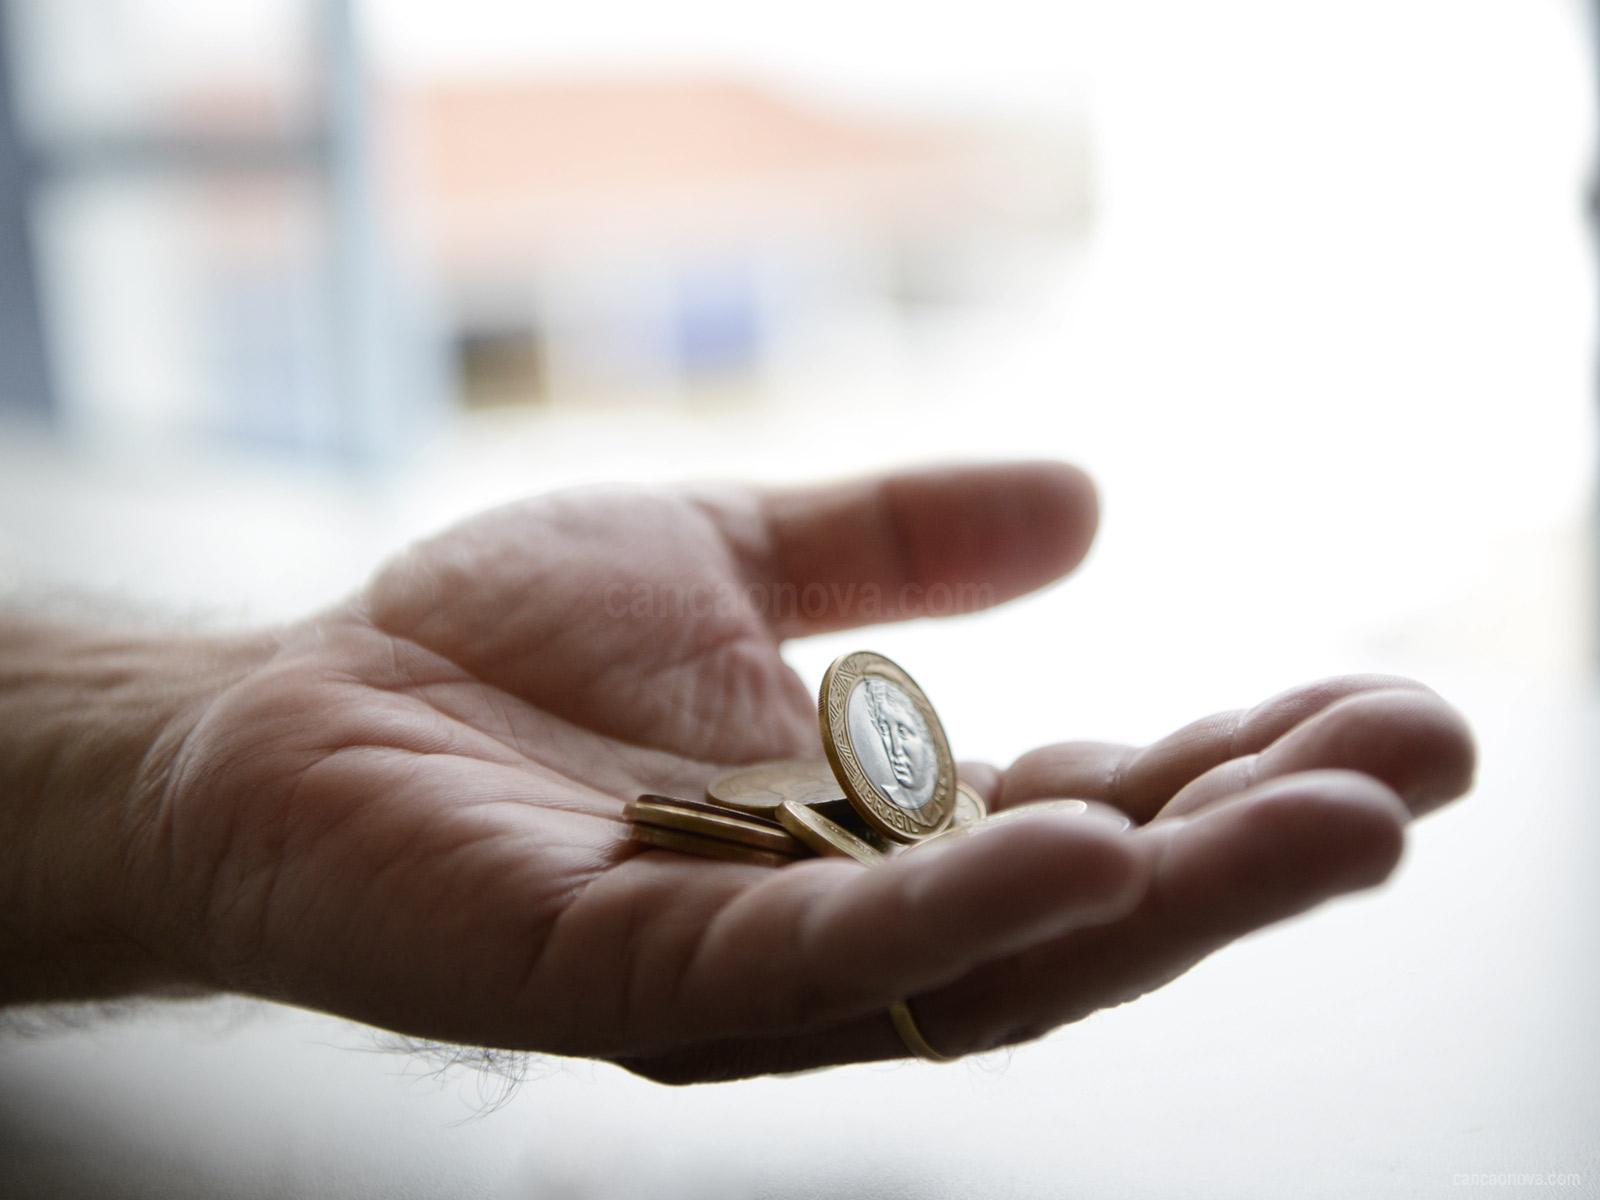 O-grande-engano-da-Teologia-da-Prosperidade